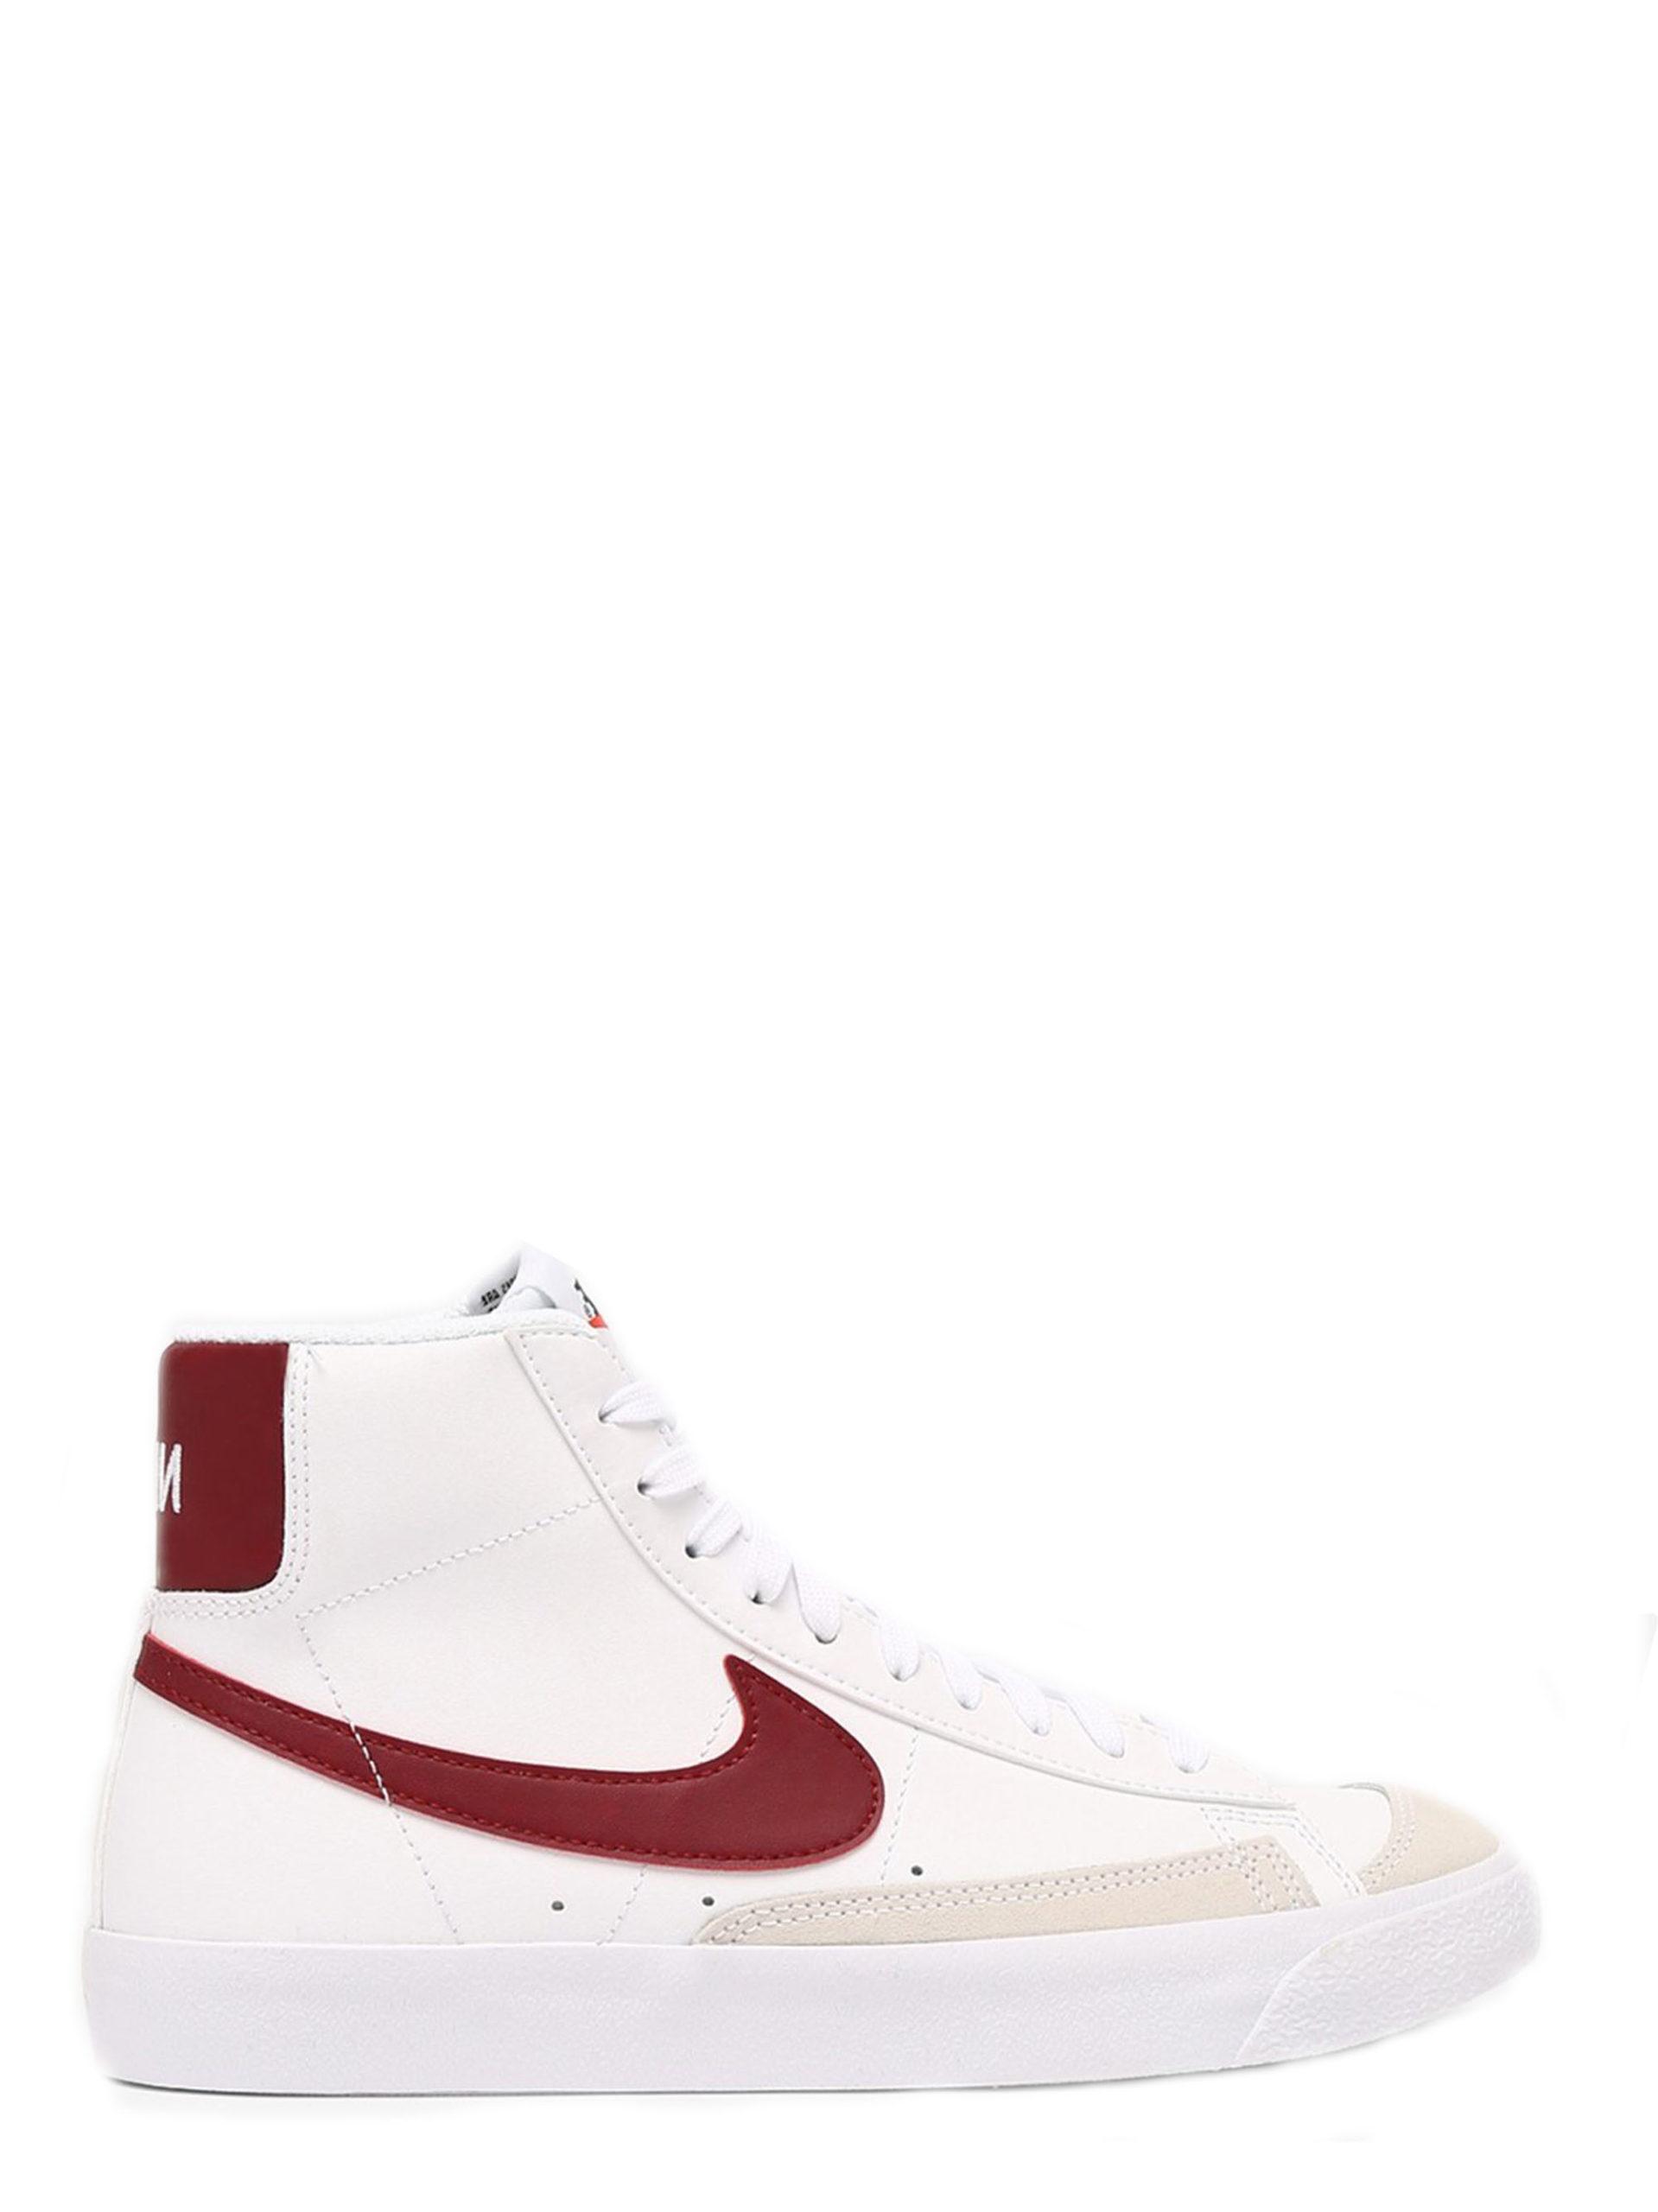 <p class='small-title'>NIKE</p>Blazer Mid '77 VINTG white/team red-white